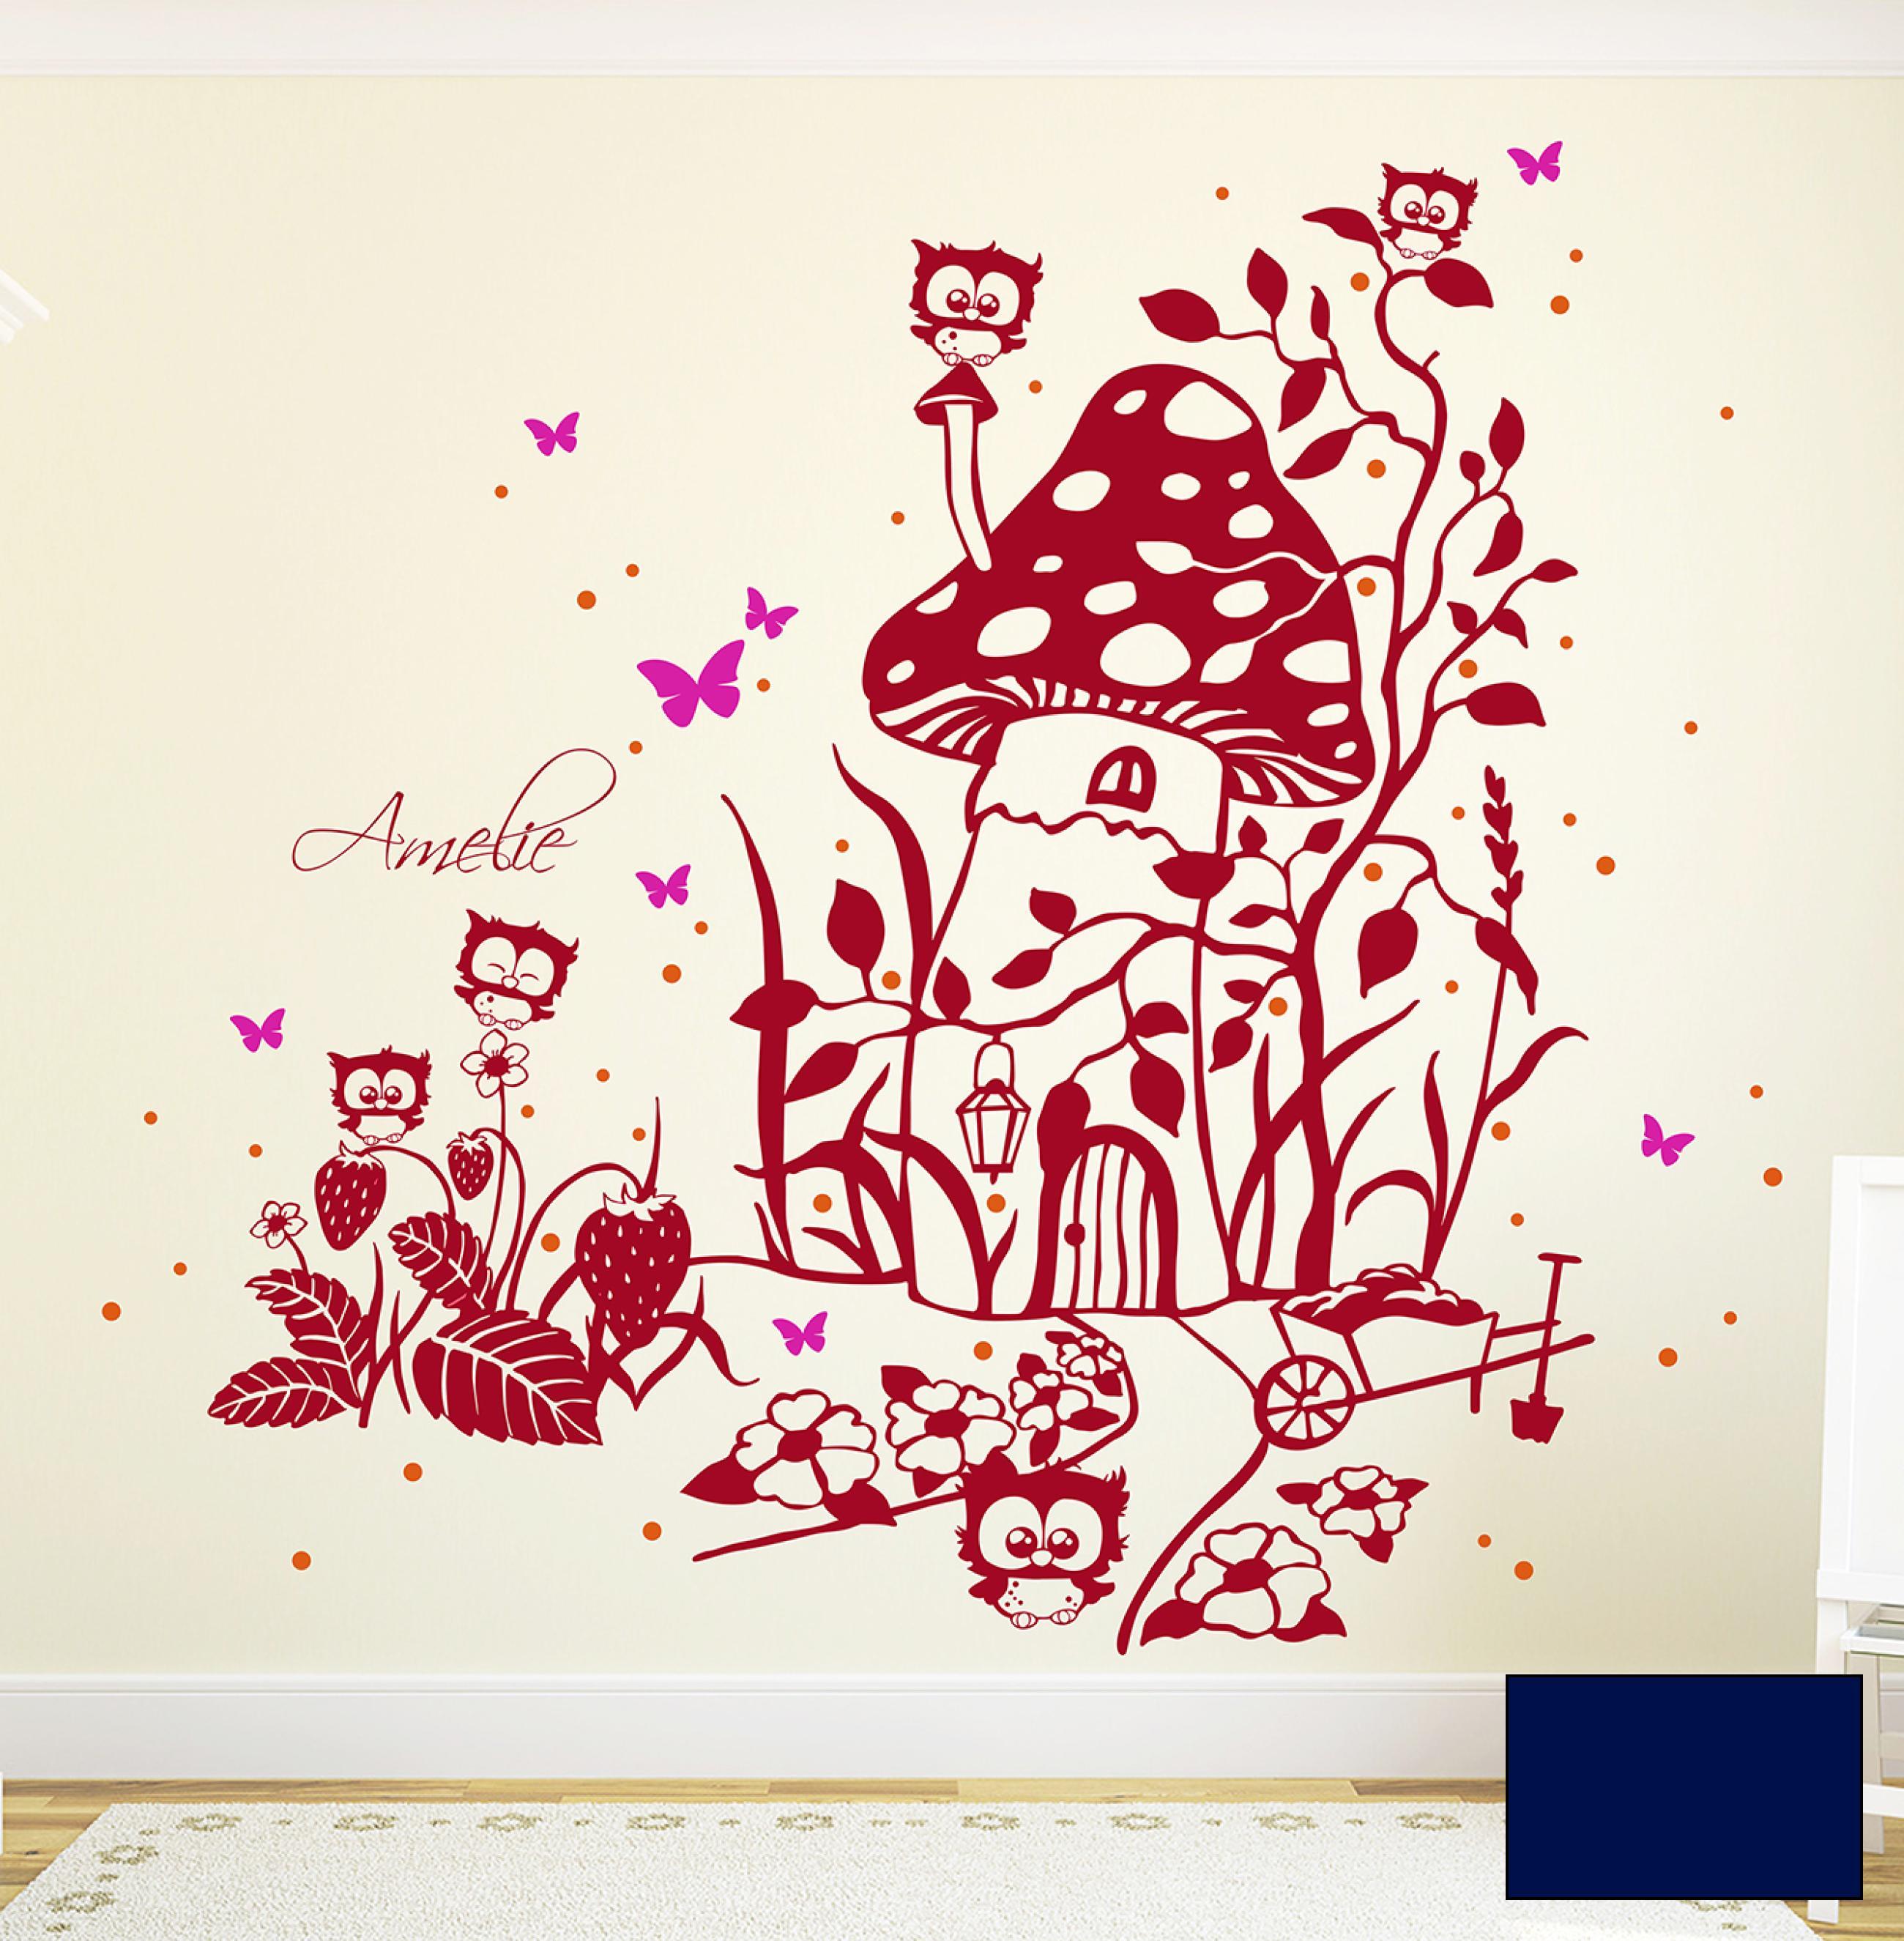 Wandtattoo eulen fliegenpilz eulenwandtattoo zweifarbig Fliegenpilz dekoration